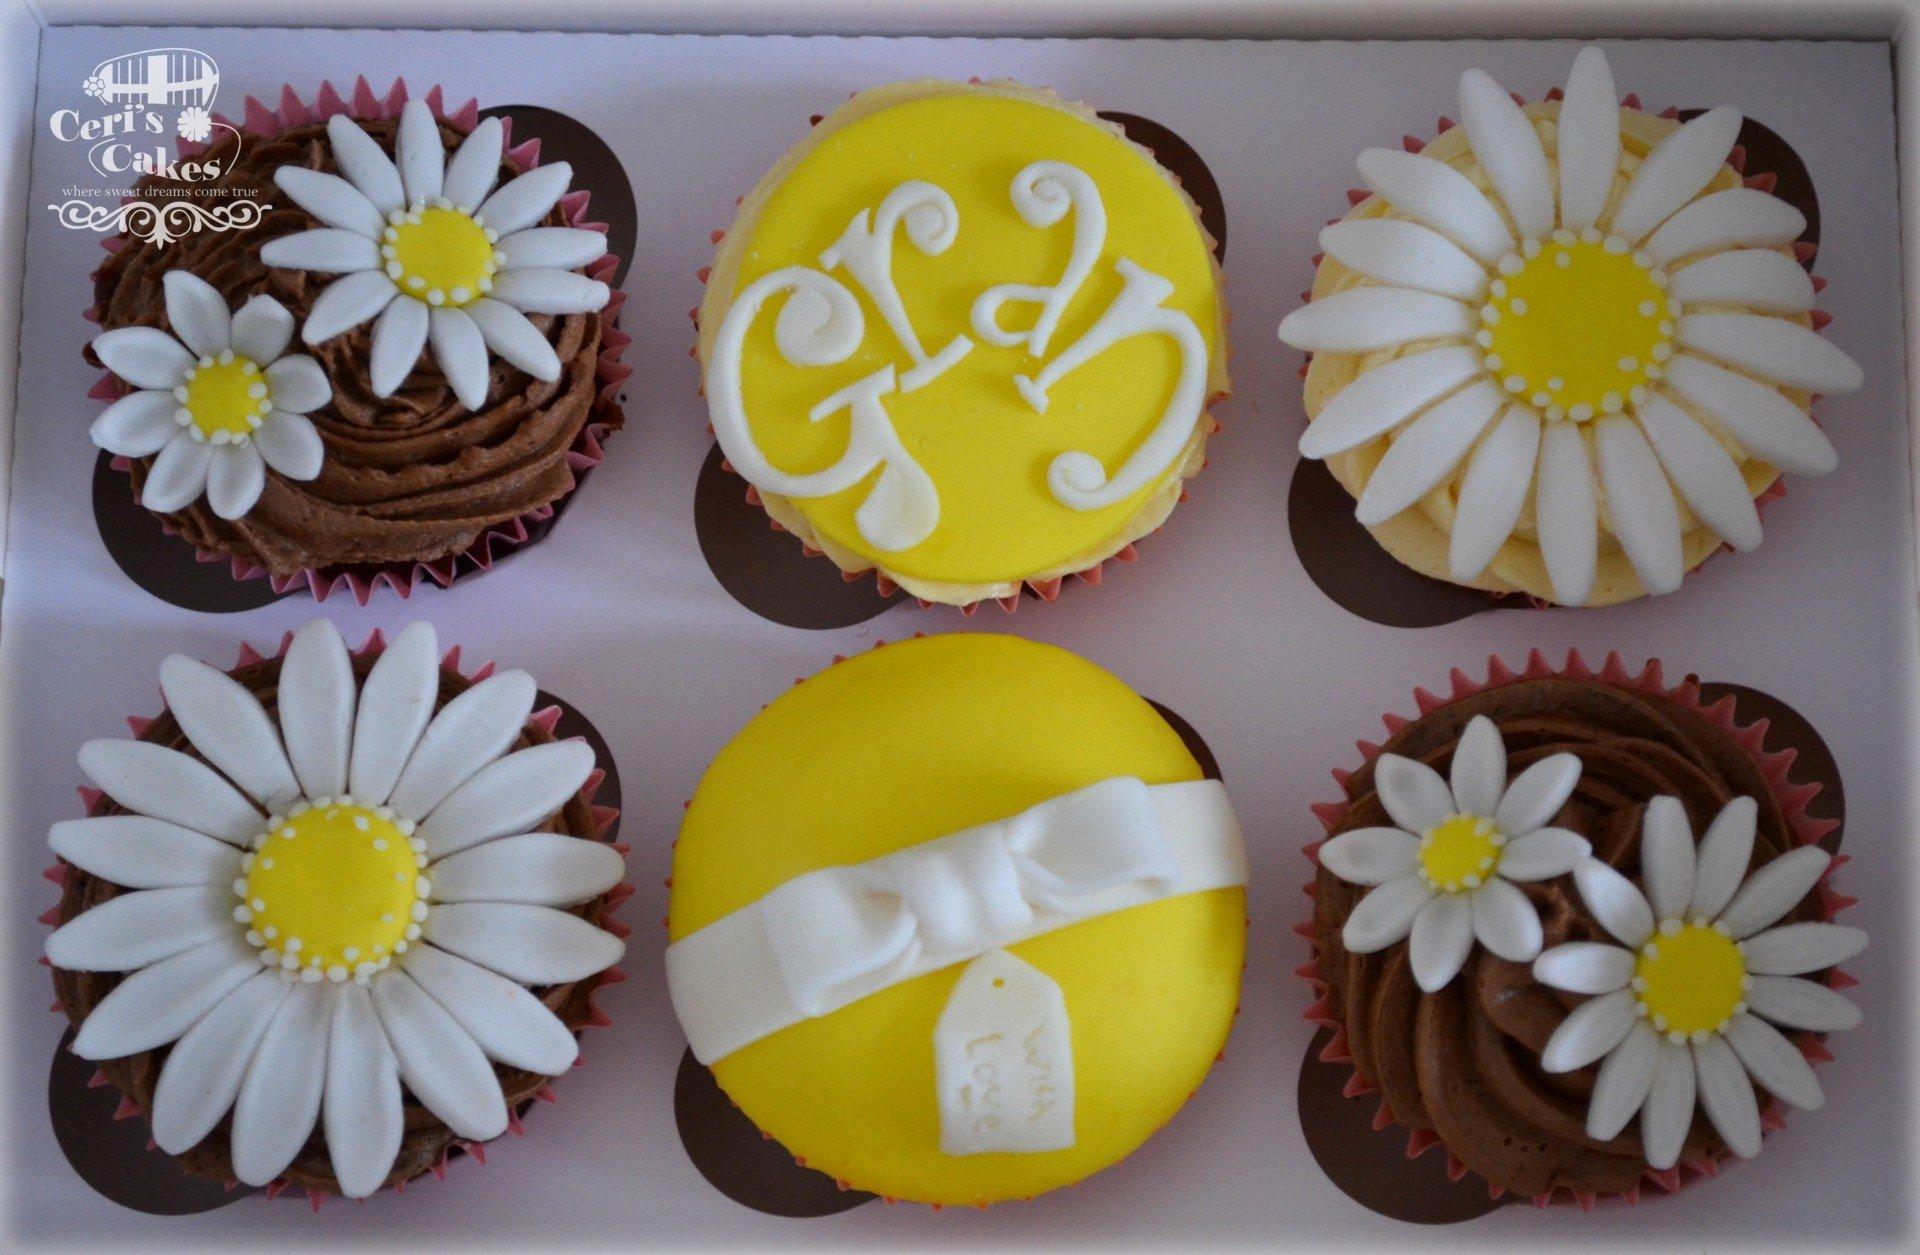 Cake Designs St Helier Jersey Ceri S Cakes